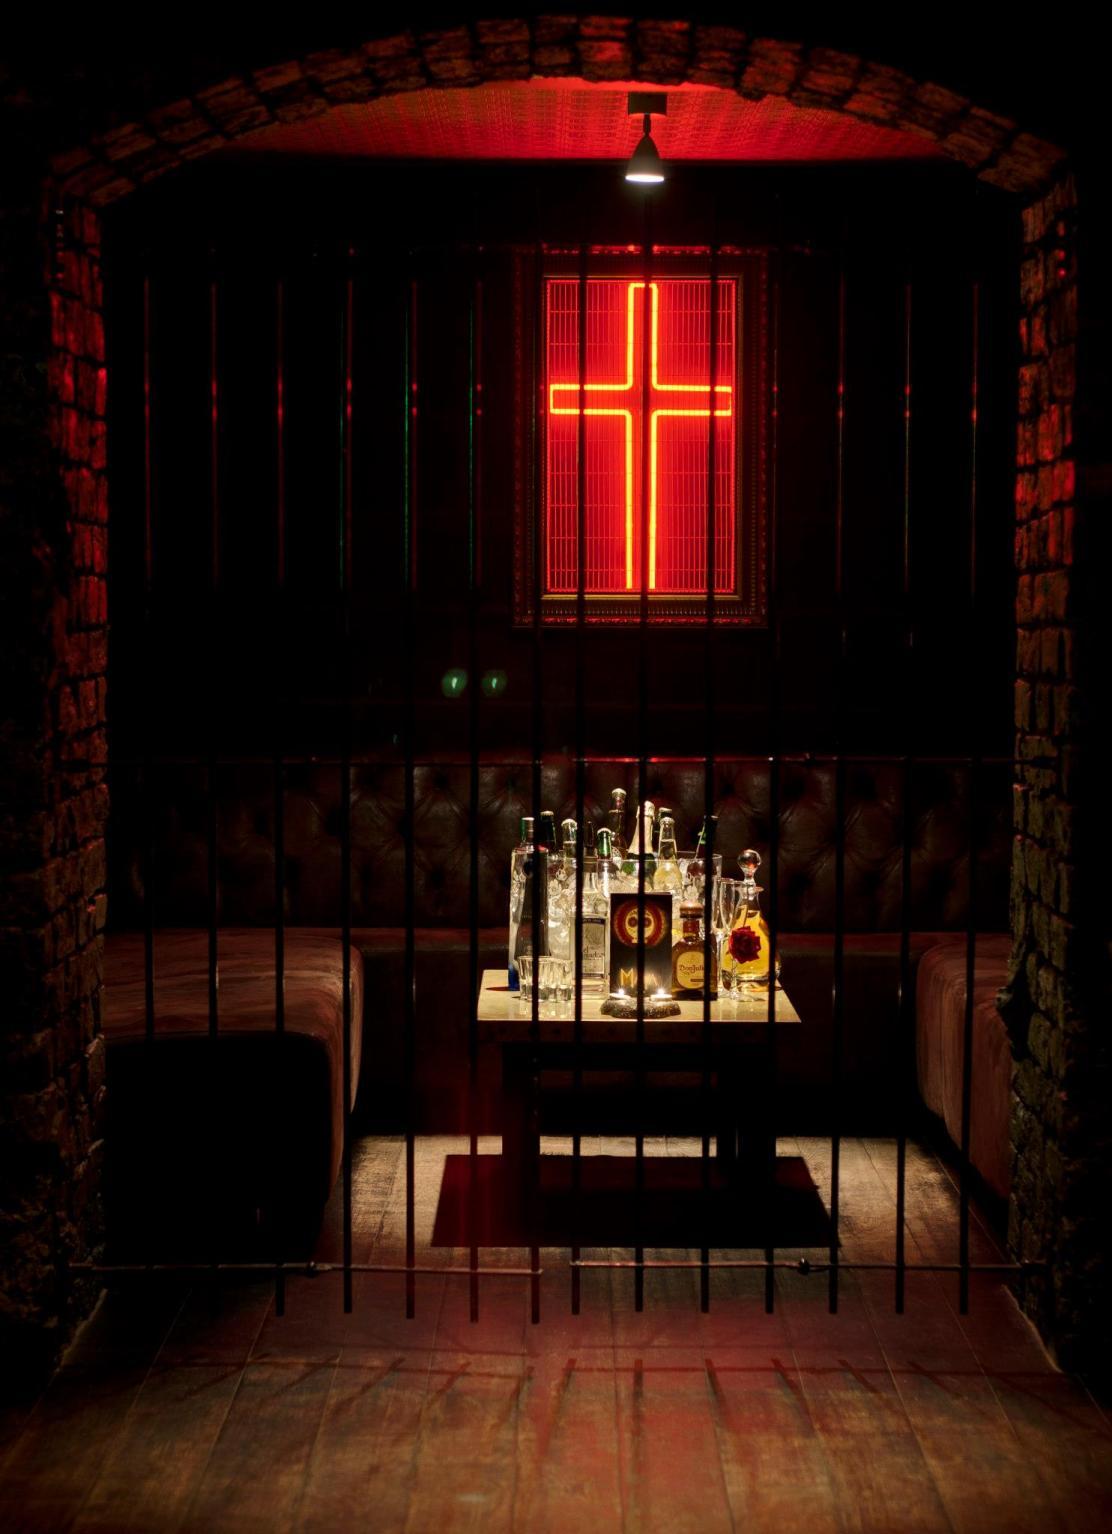 maya liverpool cocktail bar